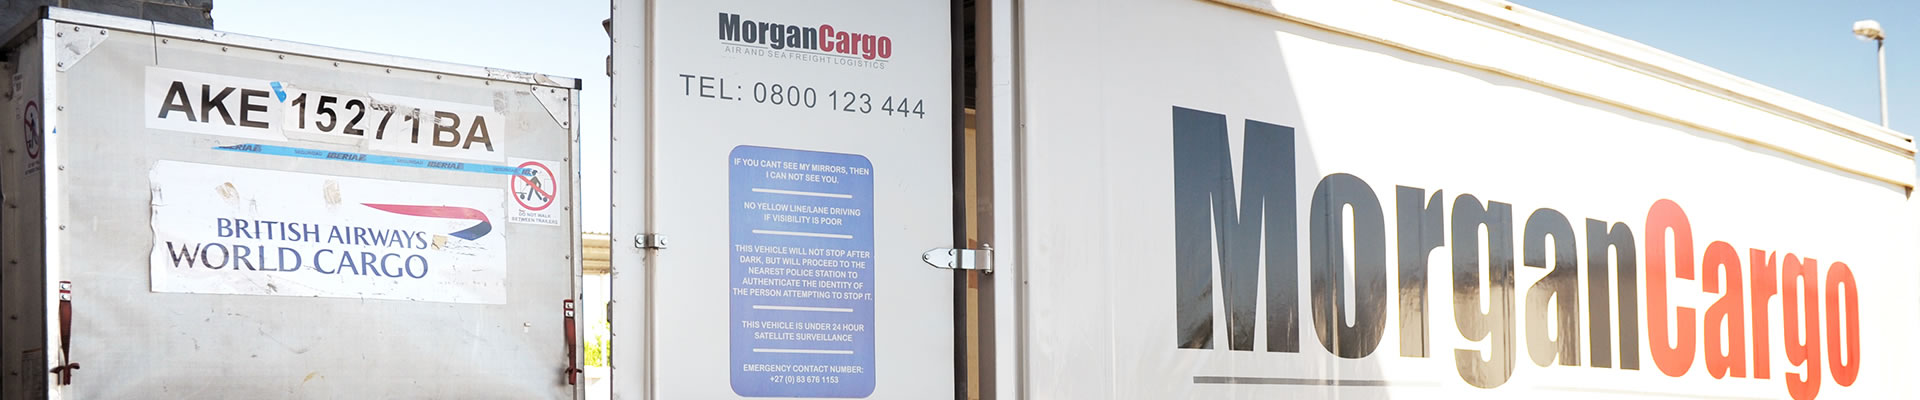 Morgan Cargo